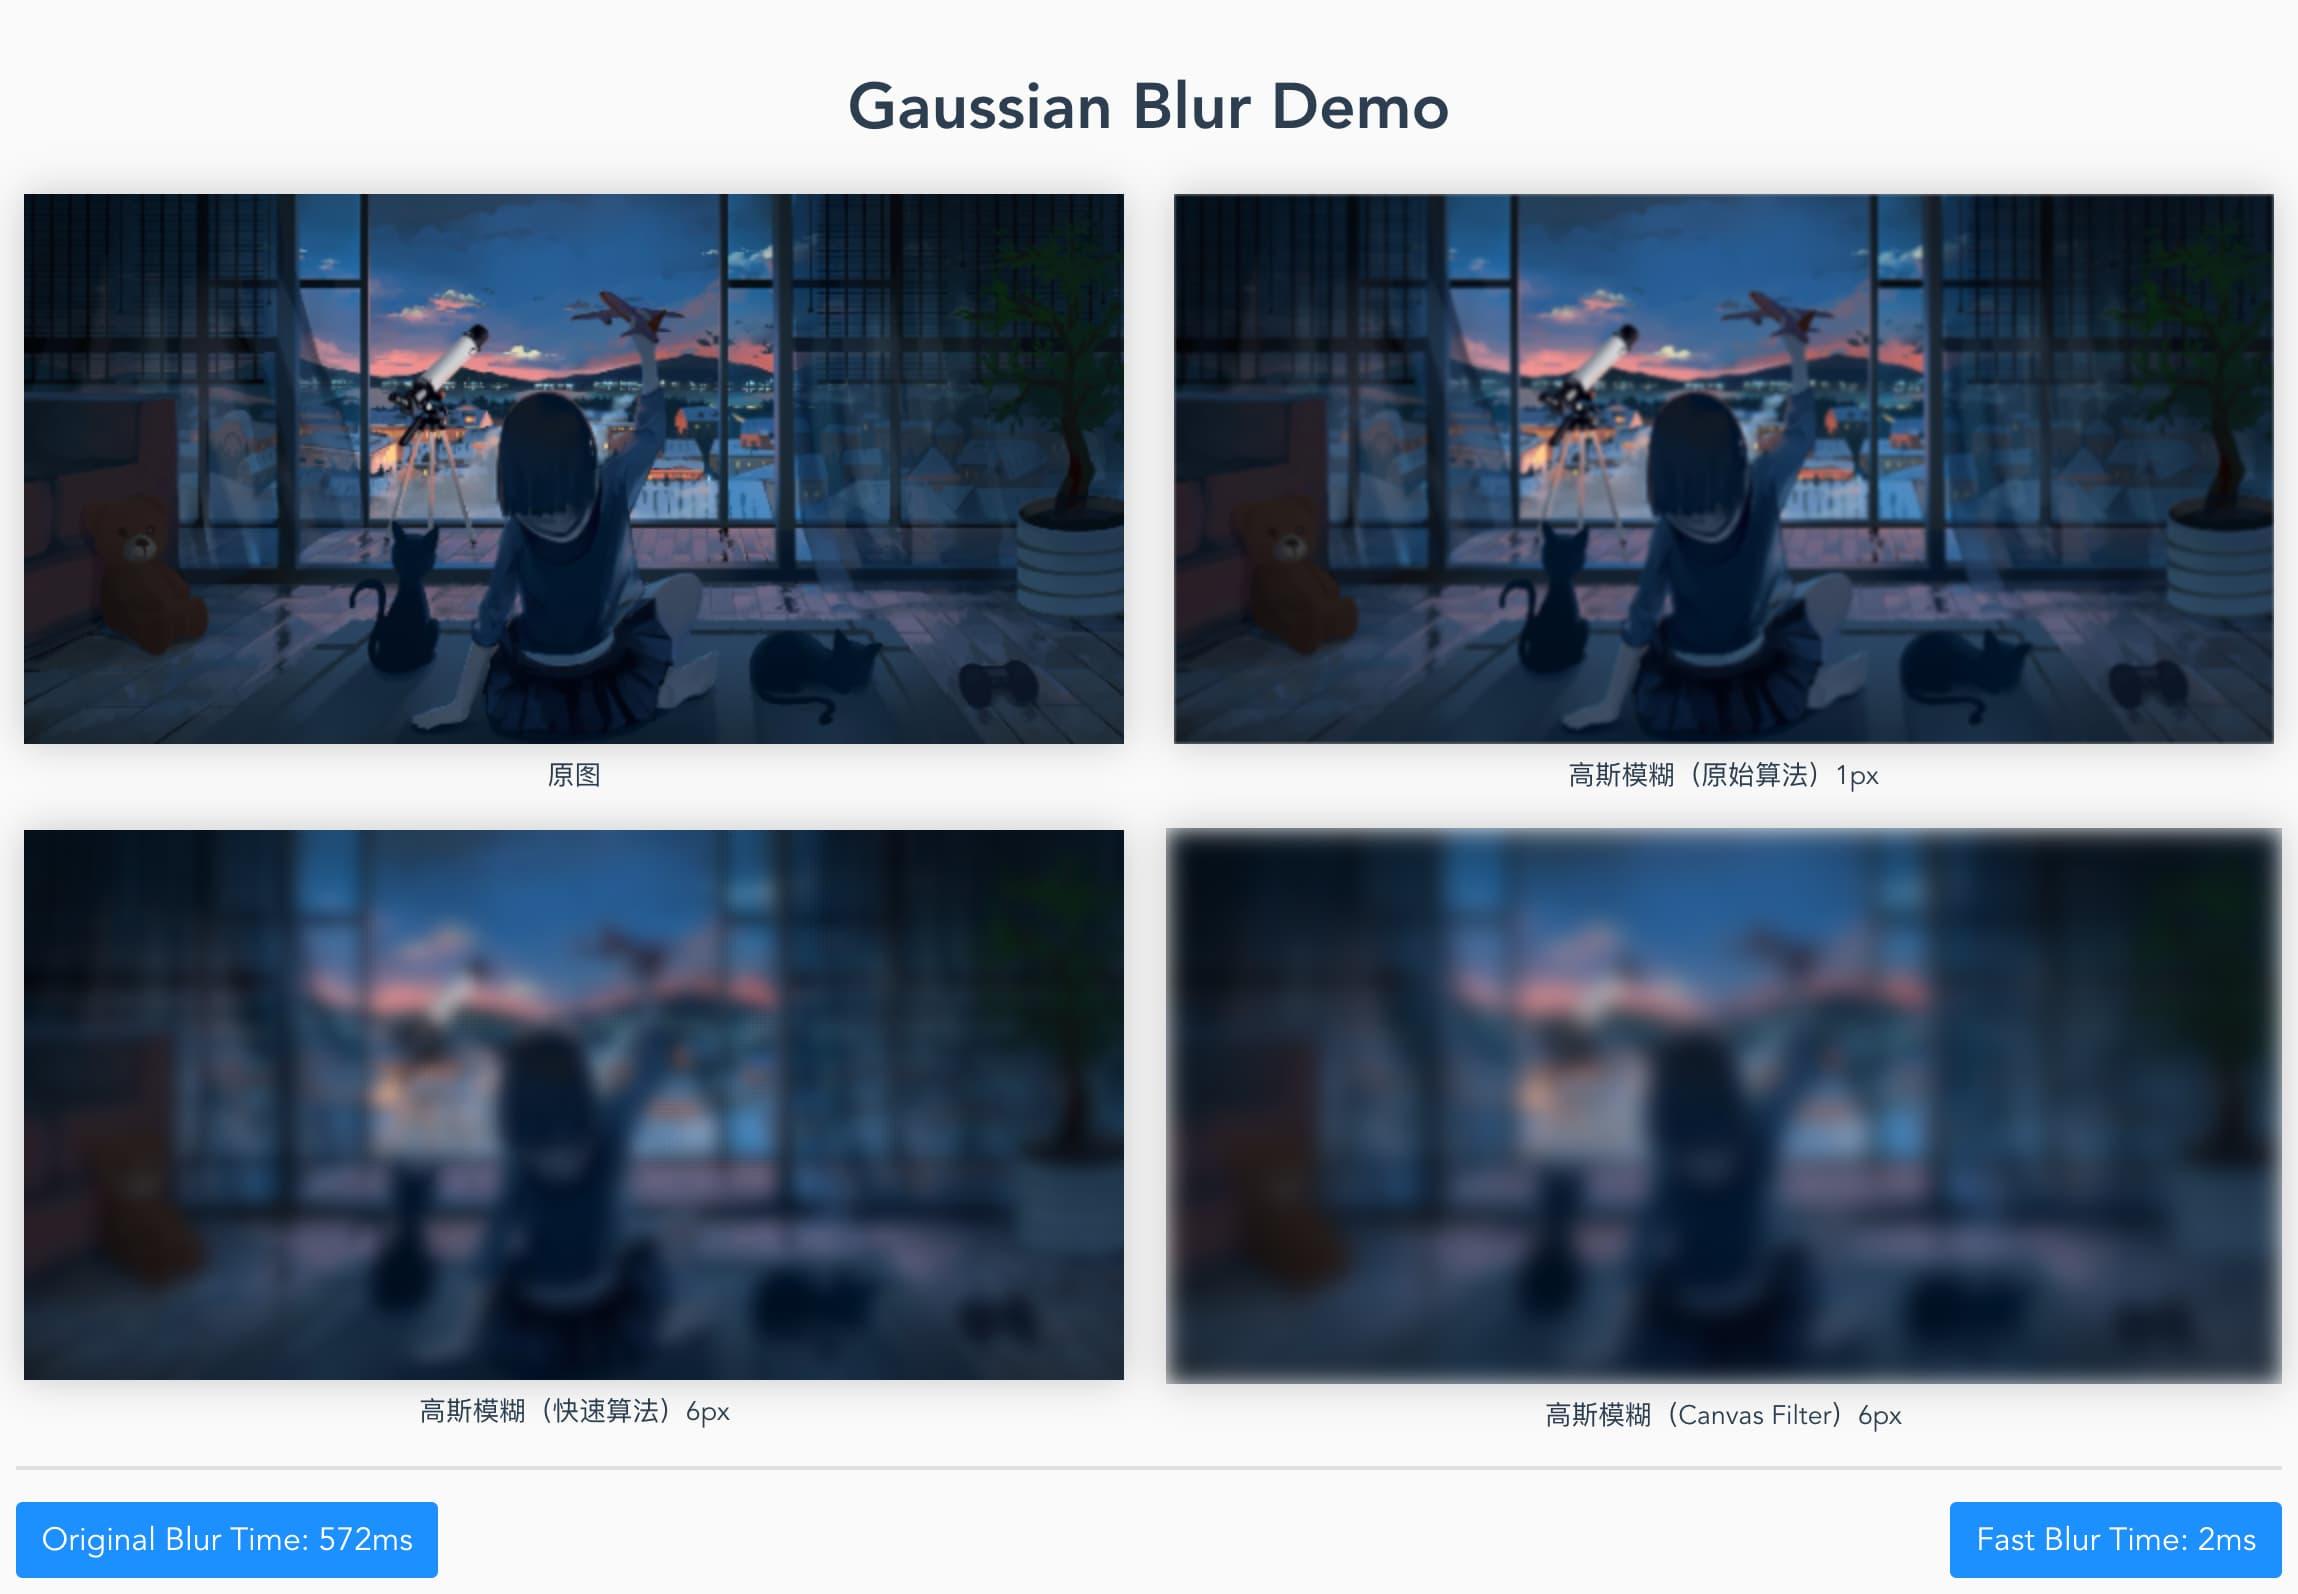 Gaussian Blur Demo